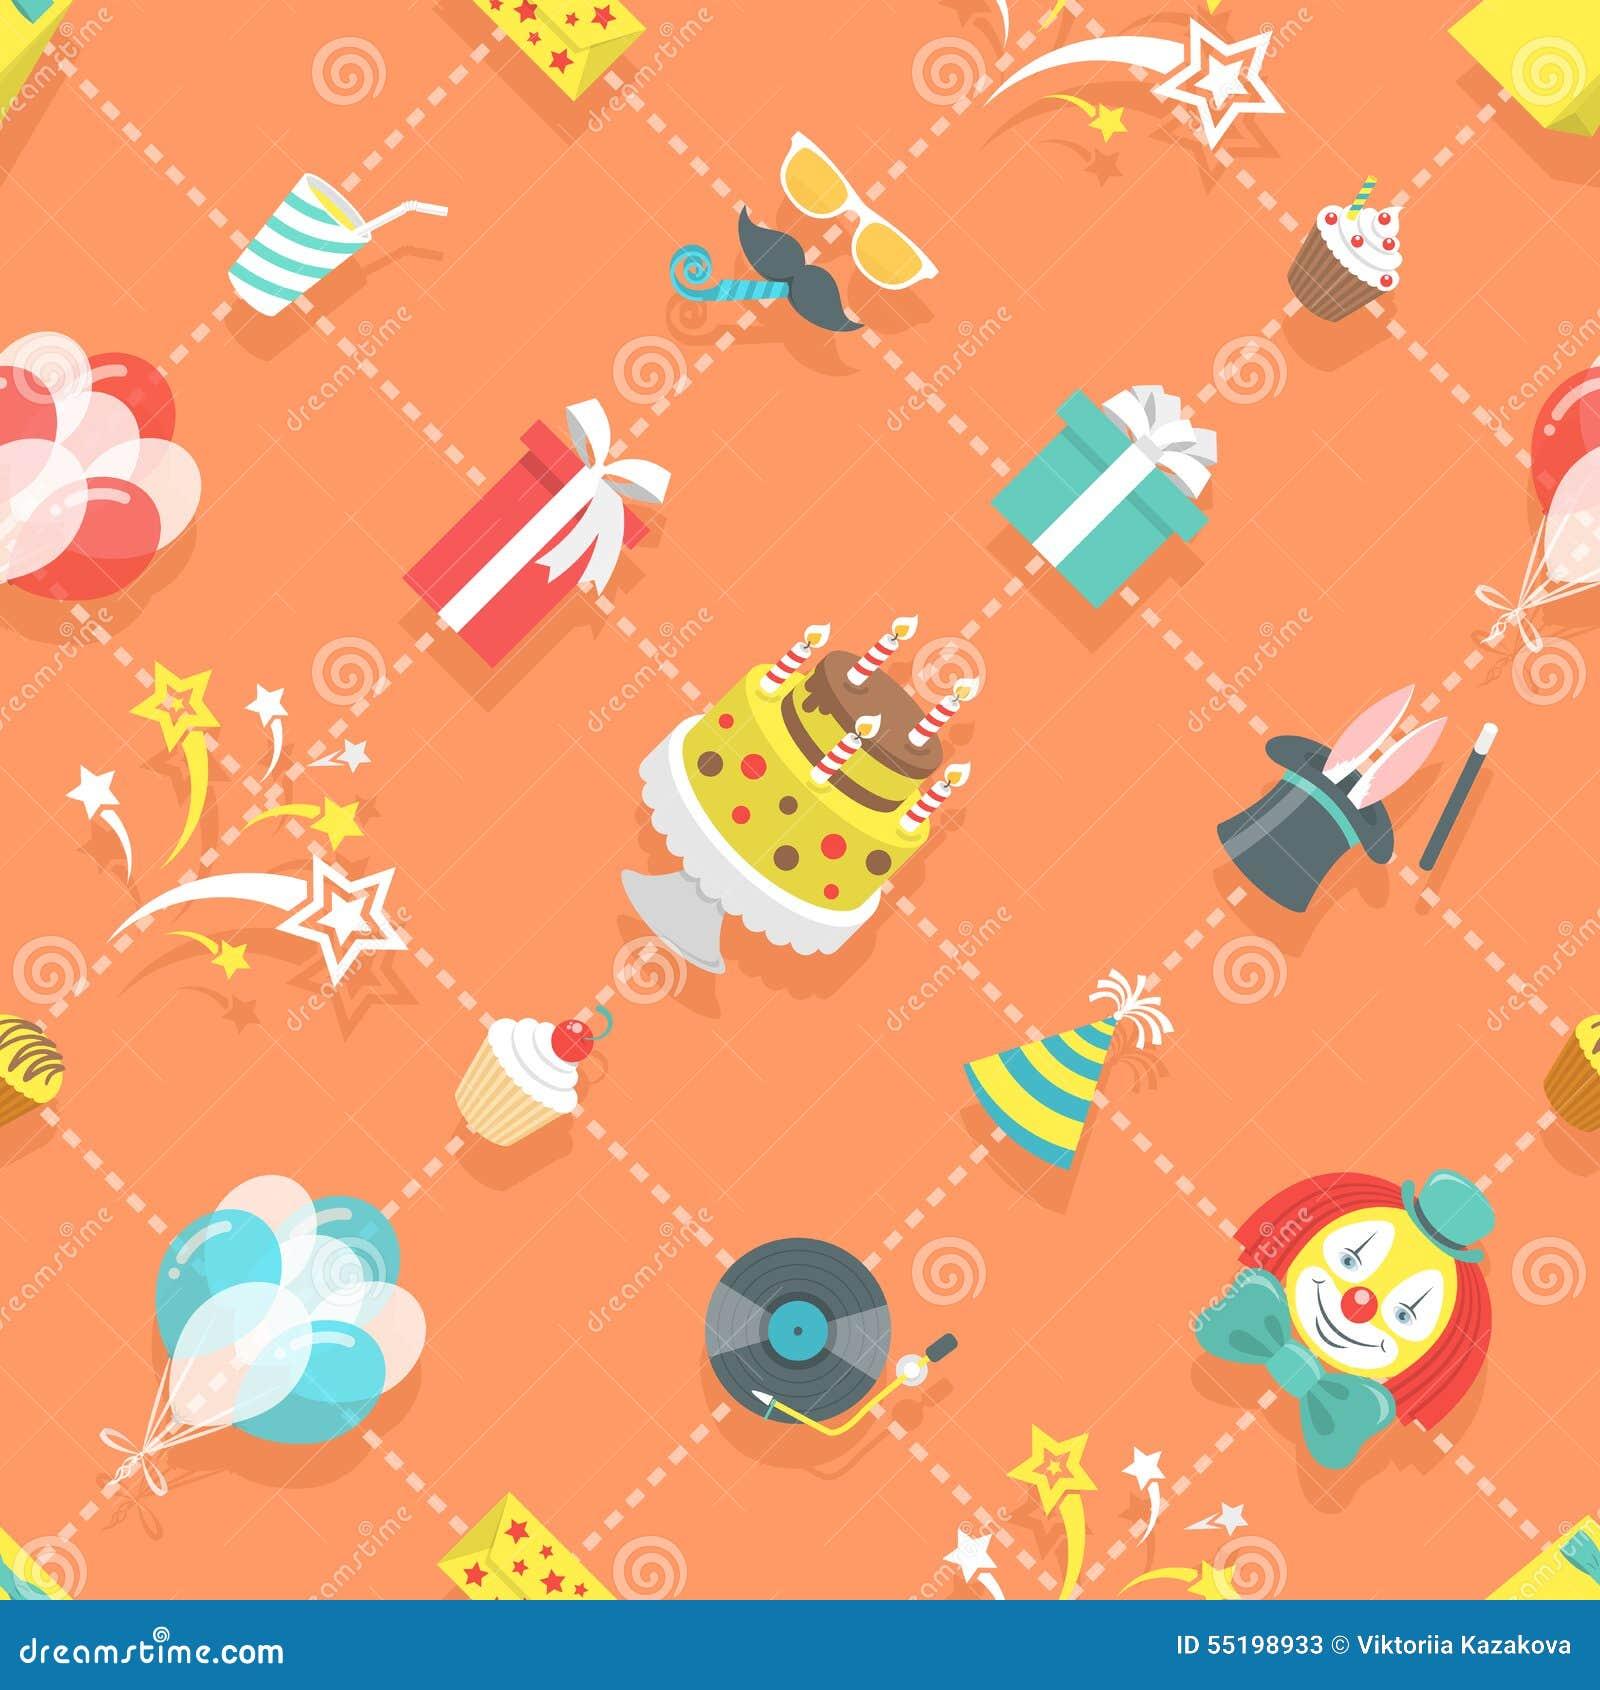 Flat Birthday Party Celebration Icons Seamless Pattern Illustration